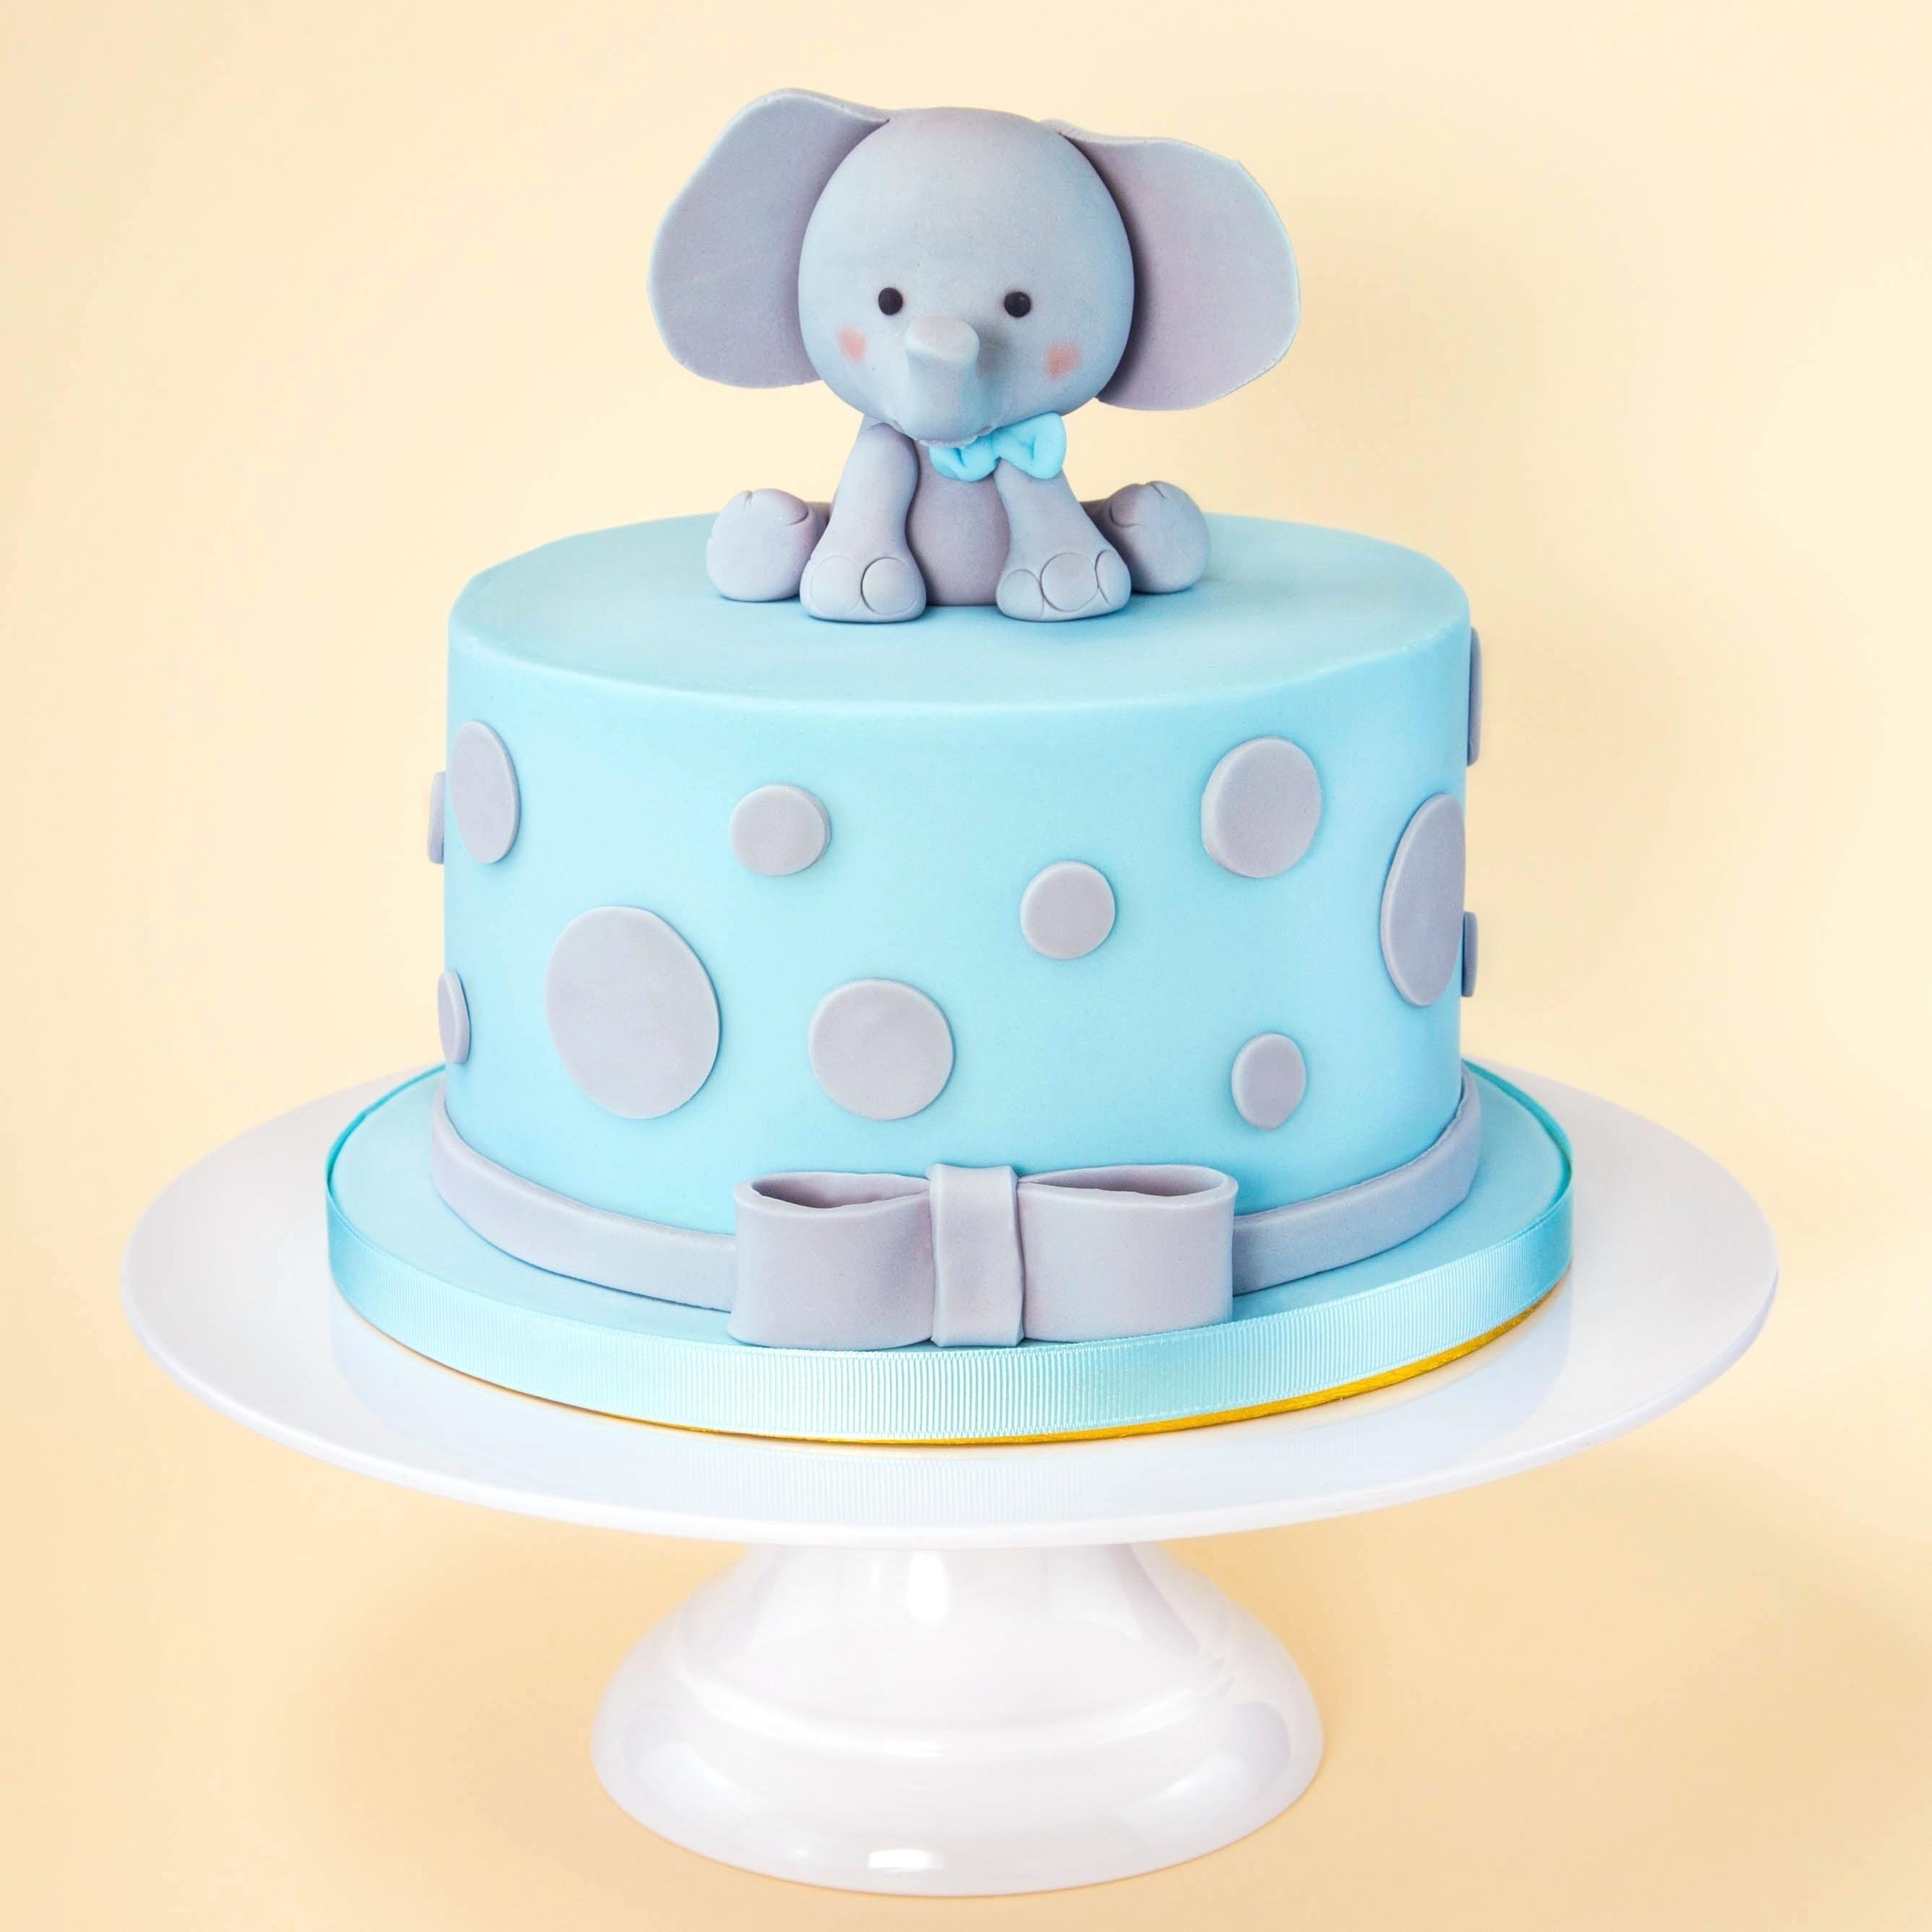 Birthday Cake Decoration For Baby Boy Baby Boy Cake Idea Blue Elephant Fondan Elephant Baby Shower Cake Baby Shower Cakes For Boys Baby Shower Cake Toppers Boy